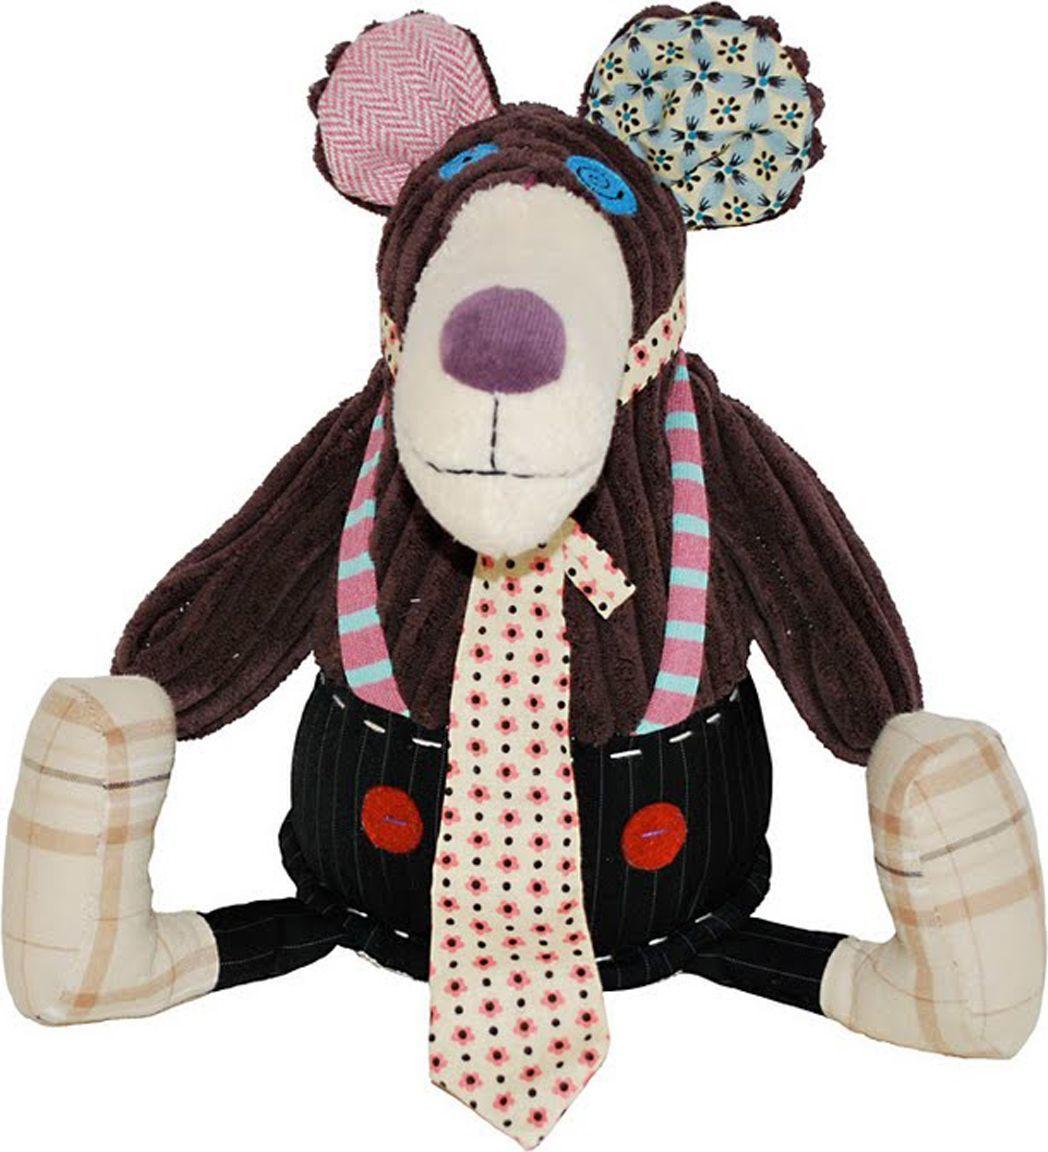 Deglingos Original Мягкая игрушка Медвежонок Gromos deglingos baby мягкая игрушка собачка nanos